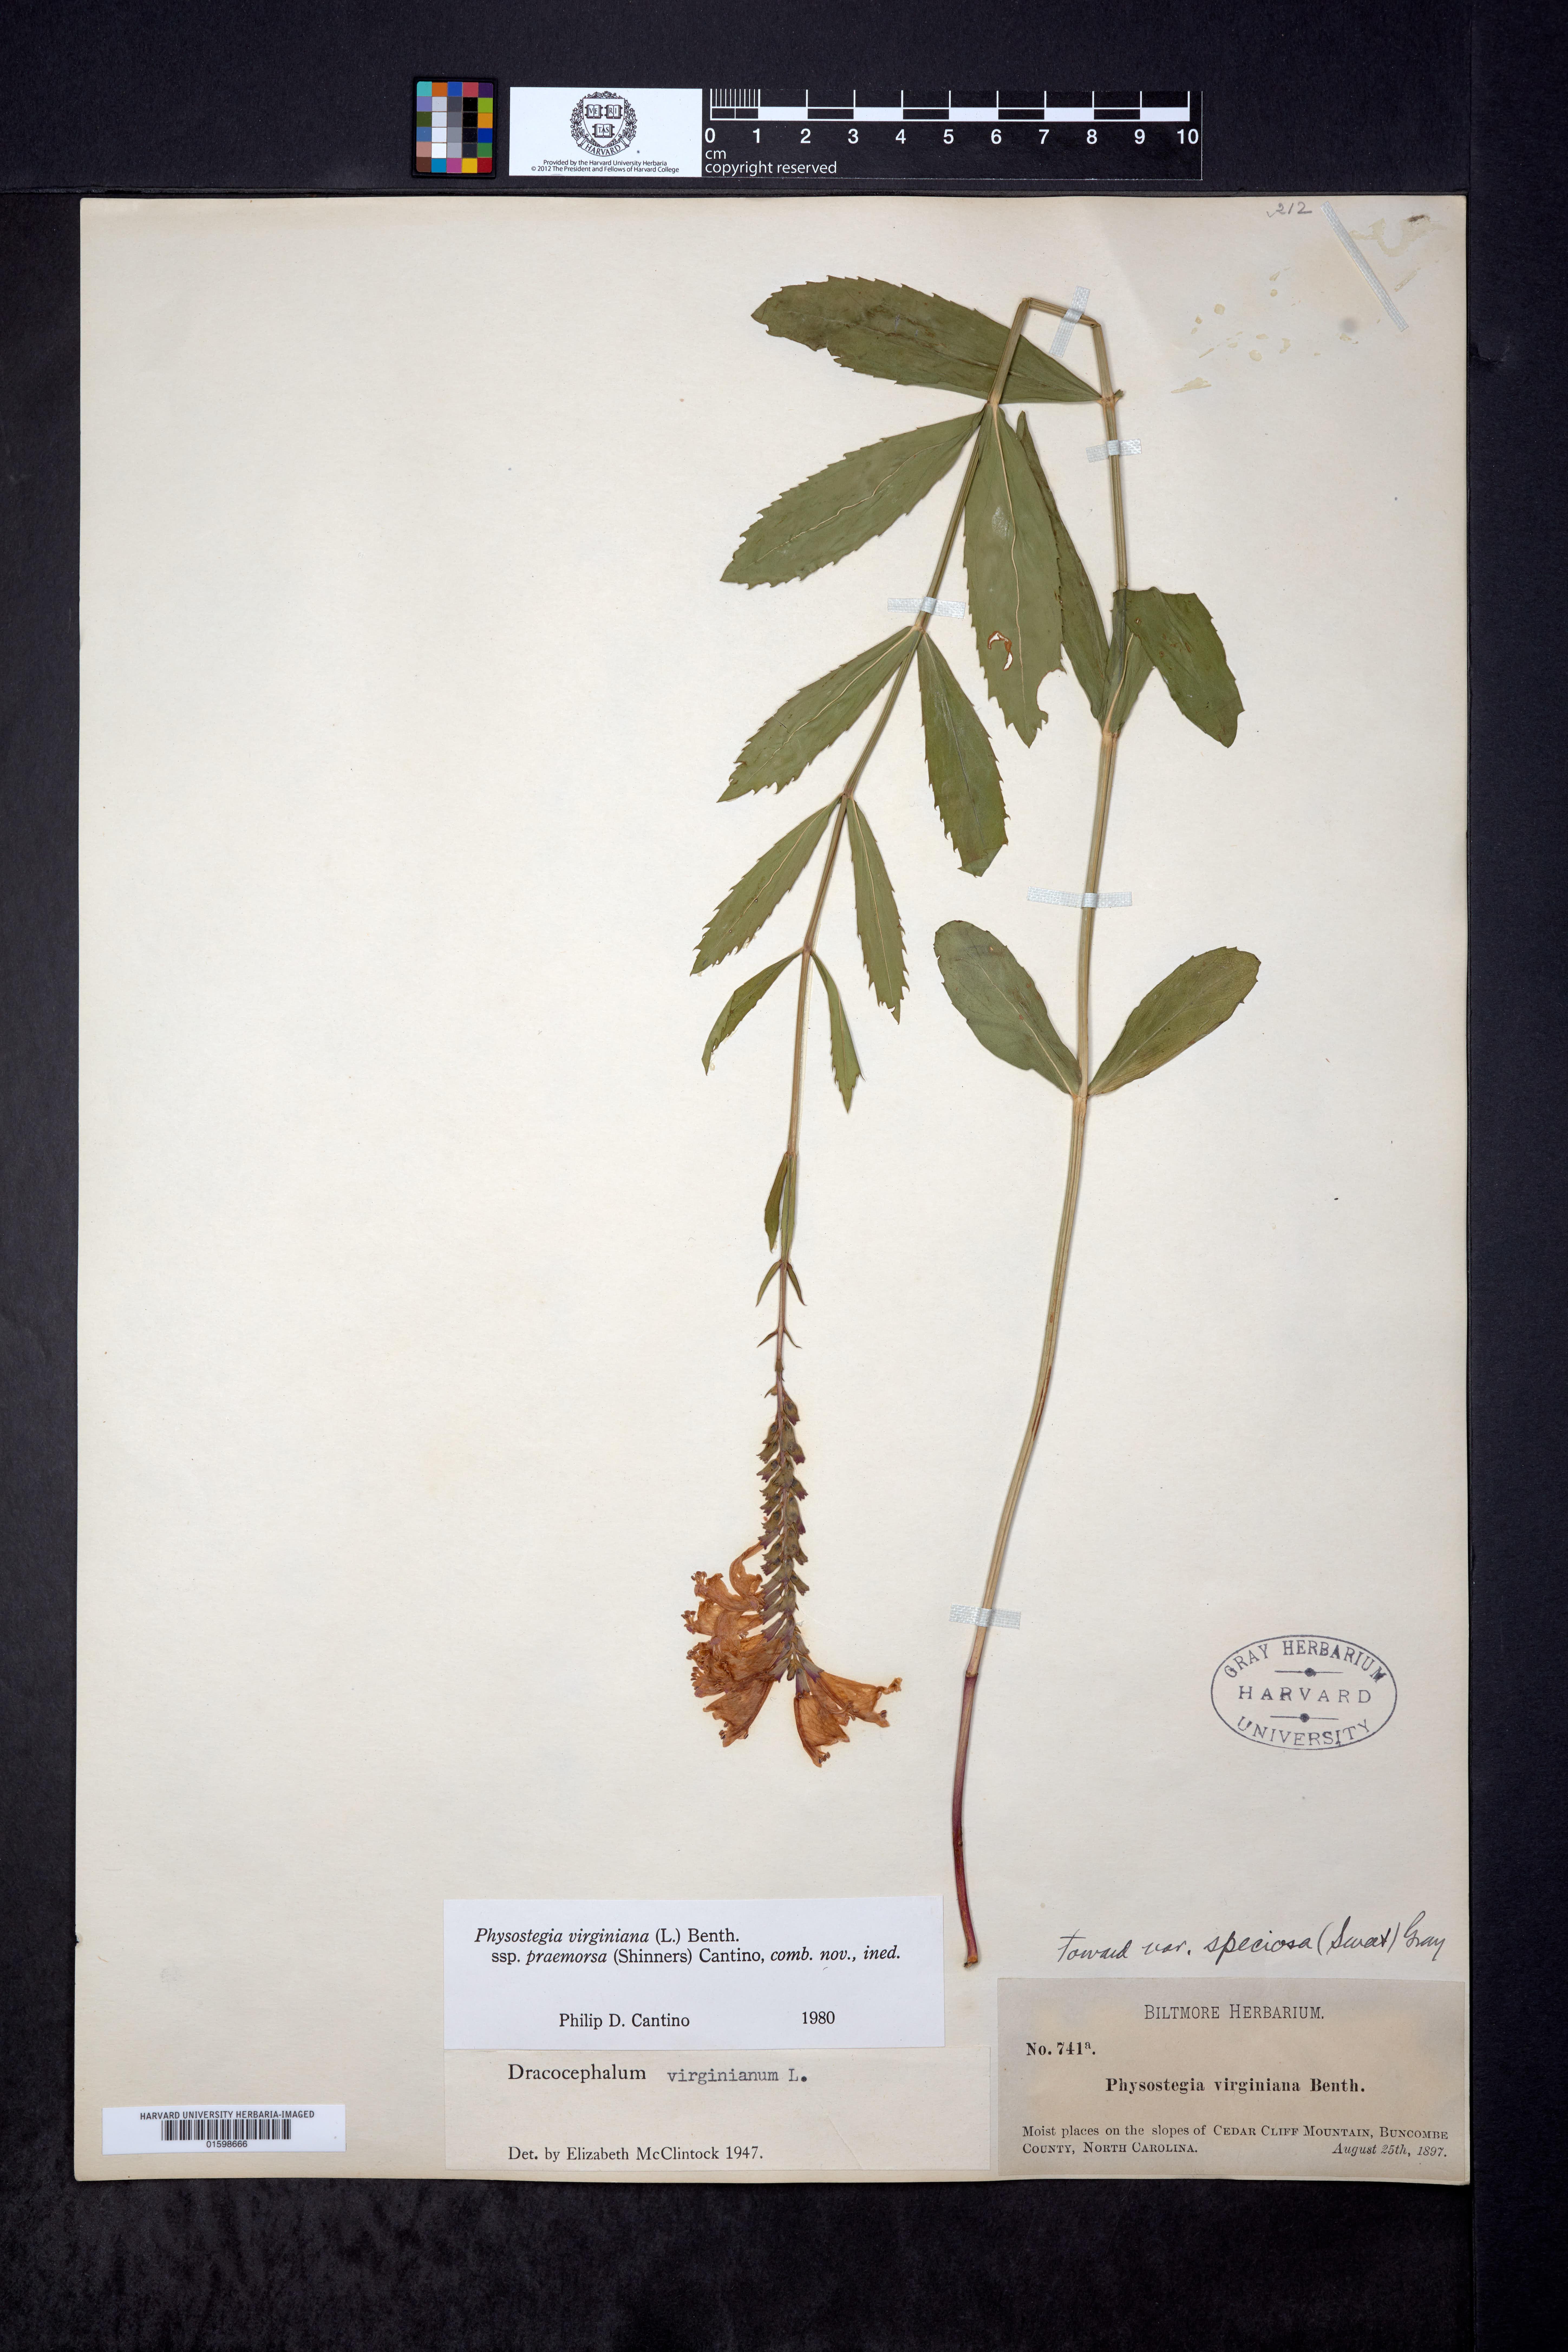 Physostegia virginiana subsp. praemorsa image